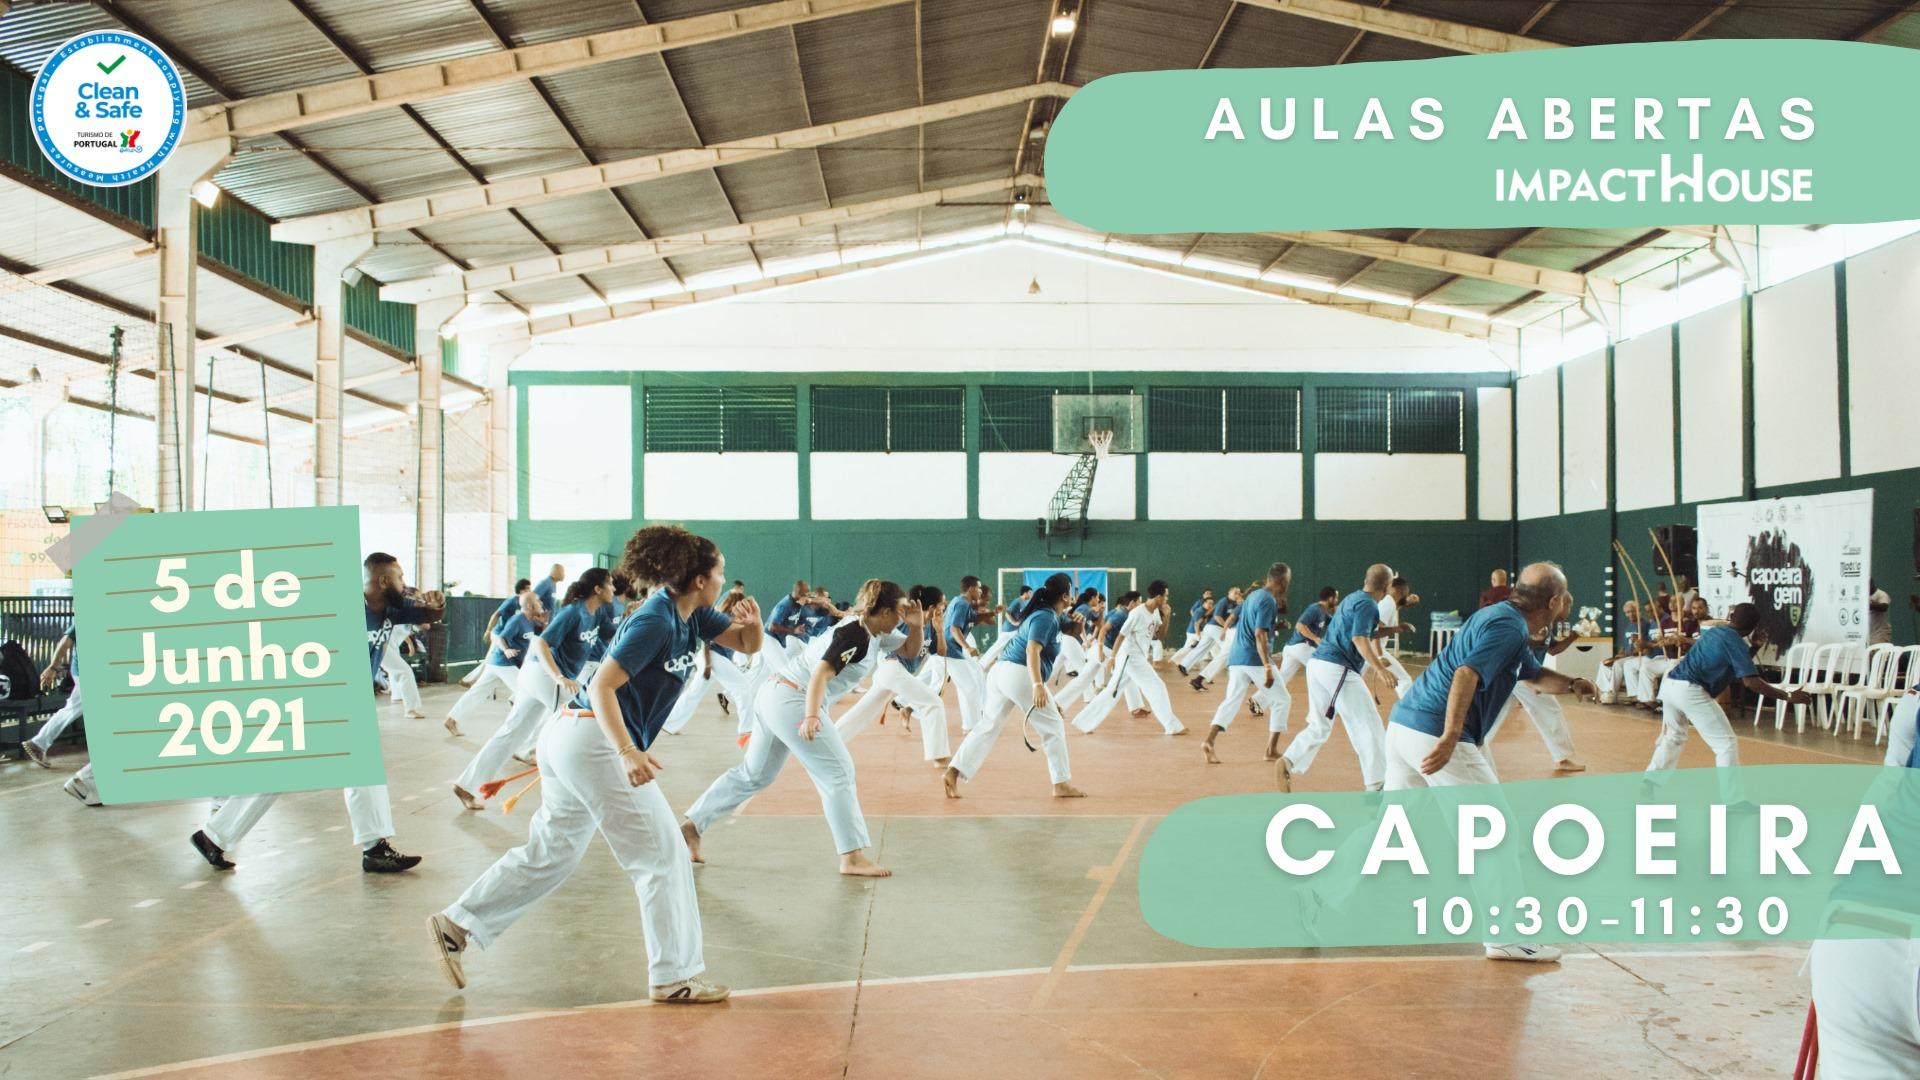 Aula Aberta EXTRA de Capoeira